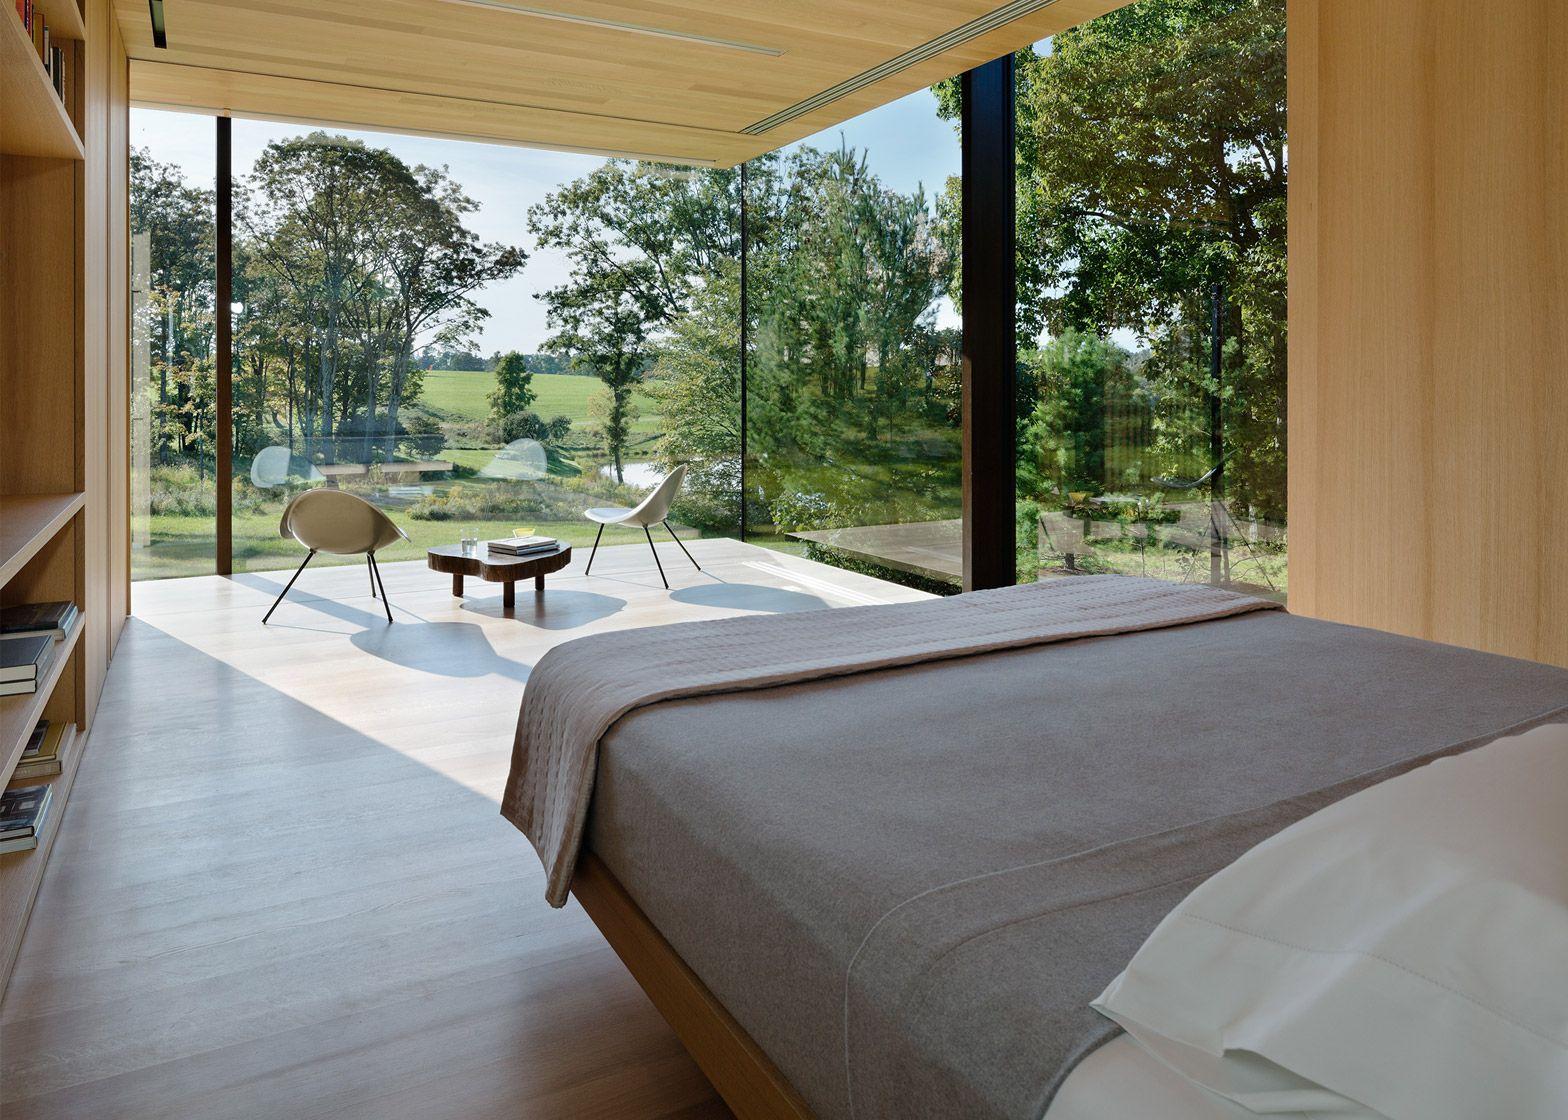 Desai Chia creates a glass box home in rural New York State ...